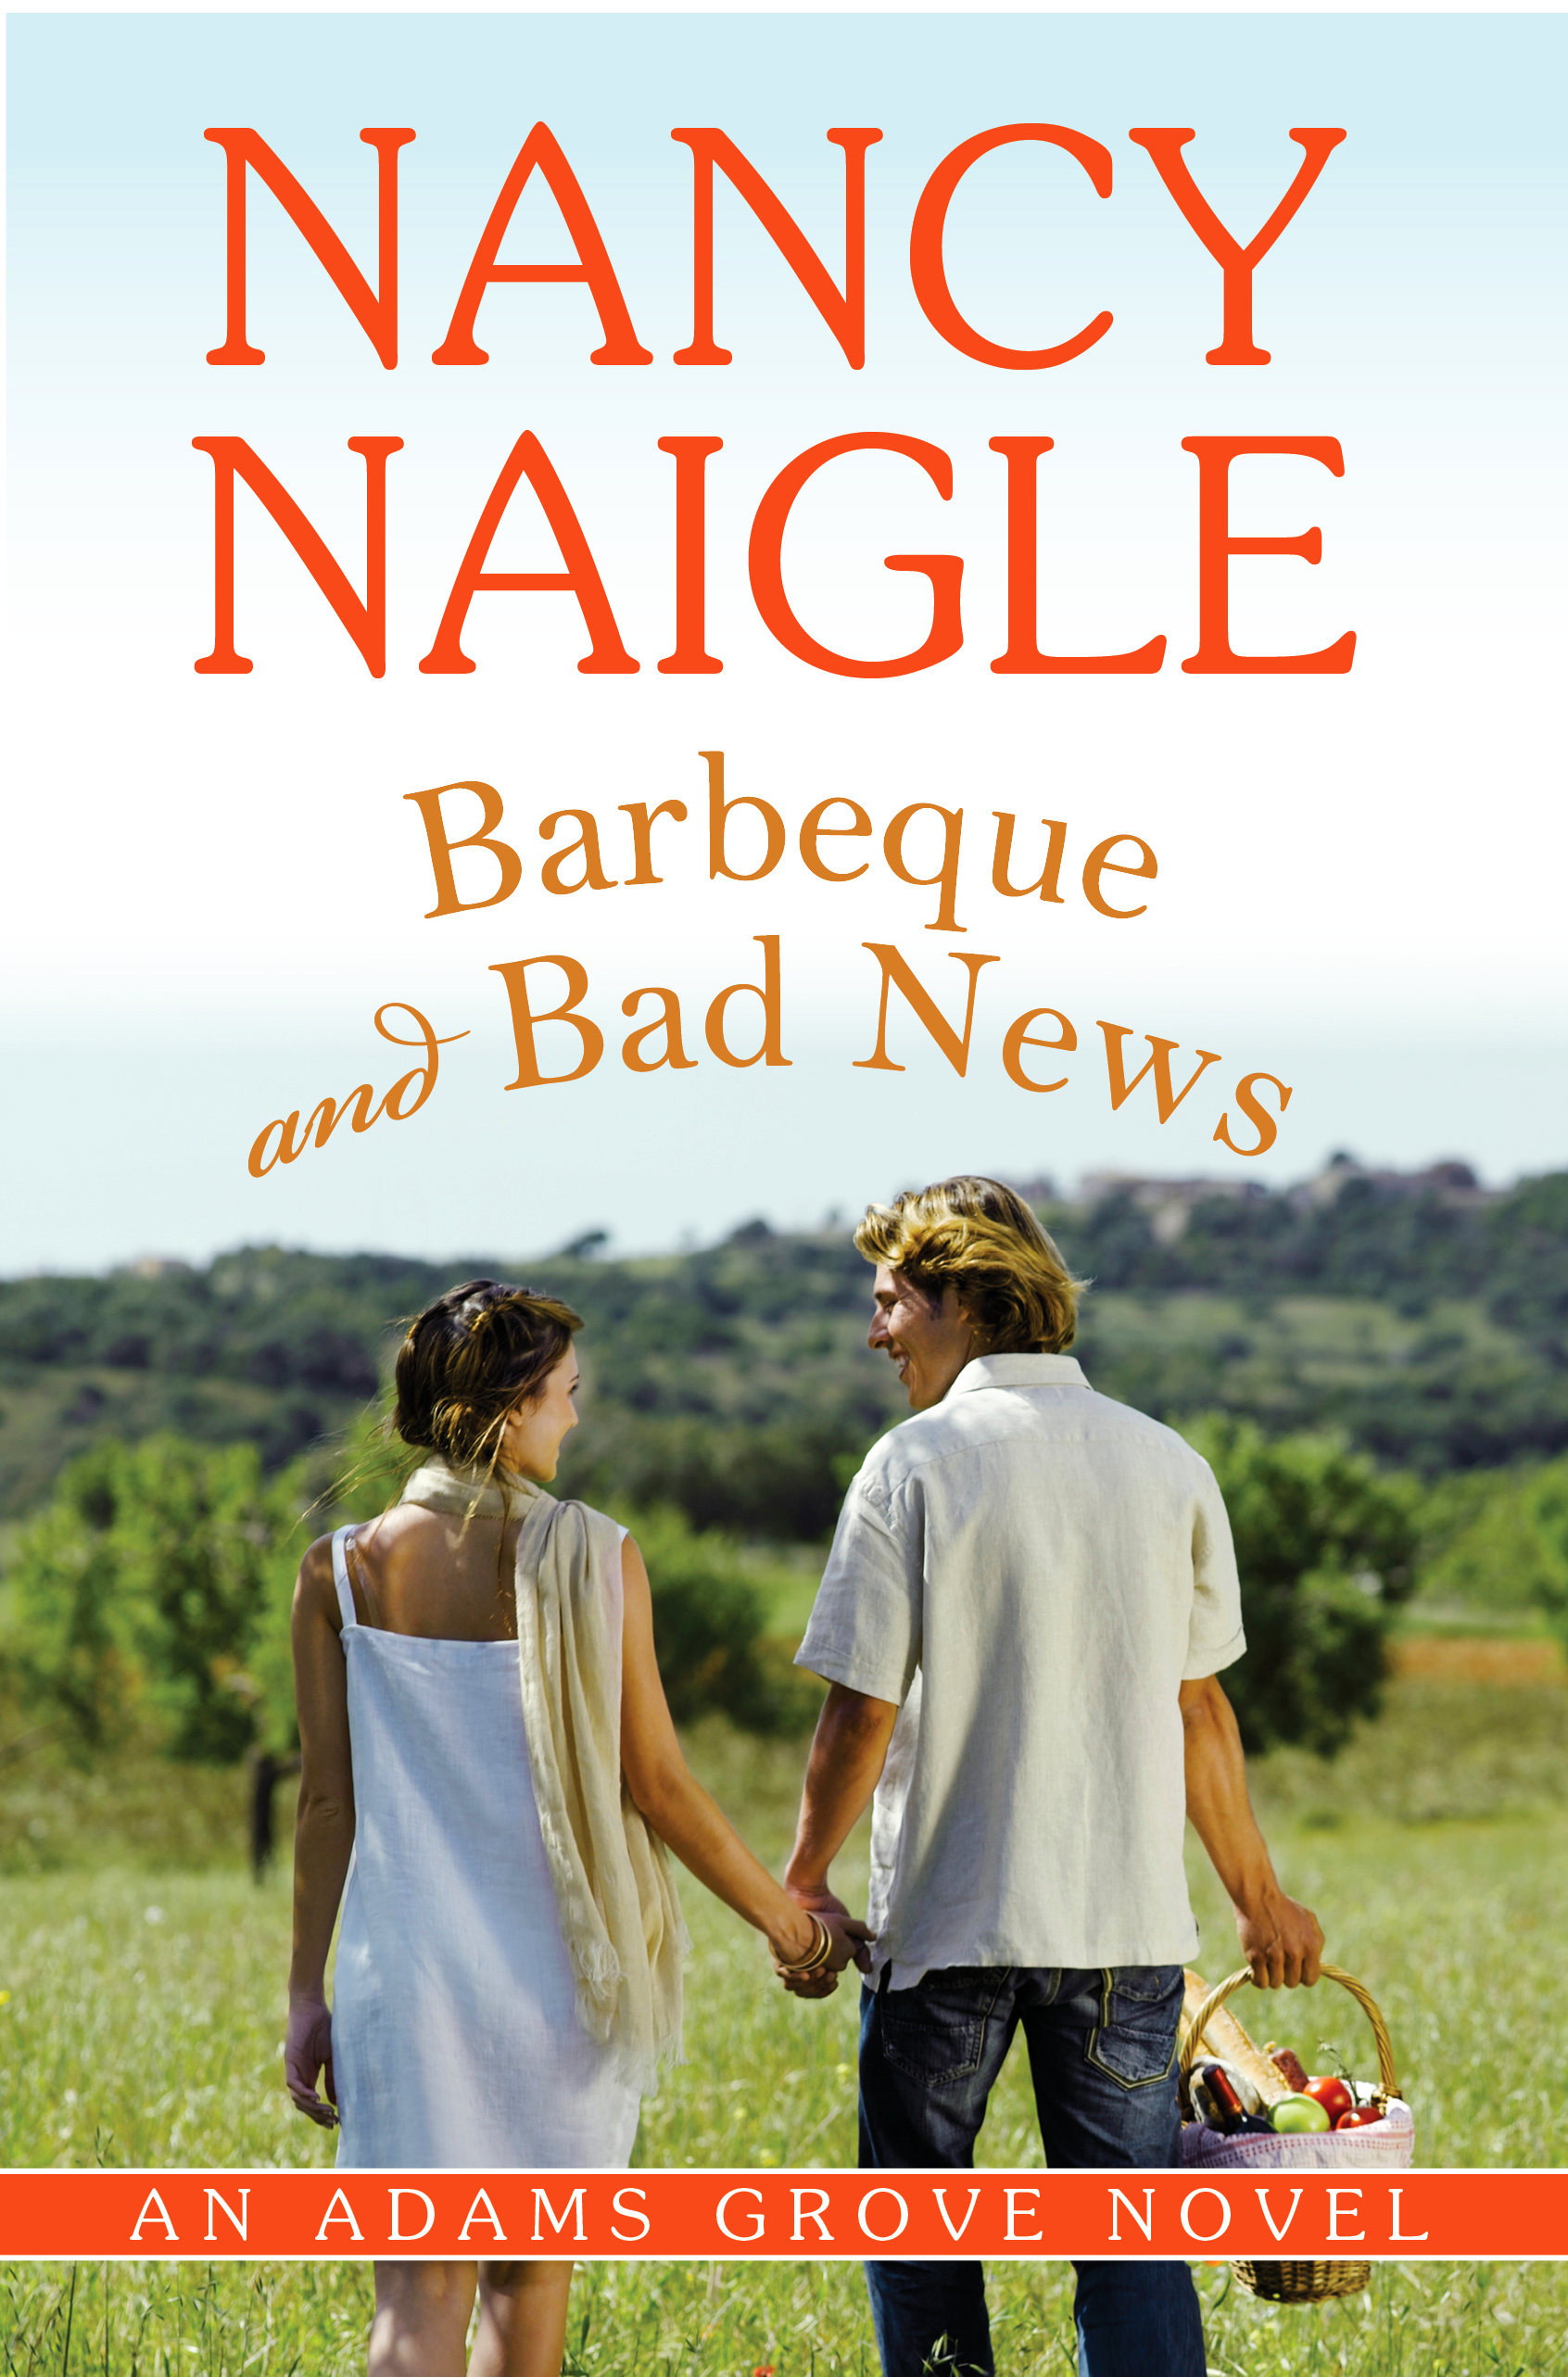 Naigle-BarbecueAndBadNews-19299-CV-FT-V1.jpg